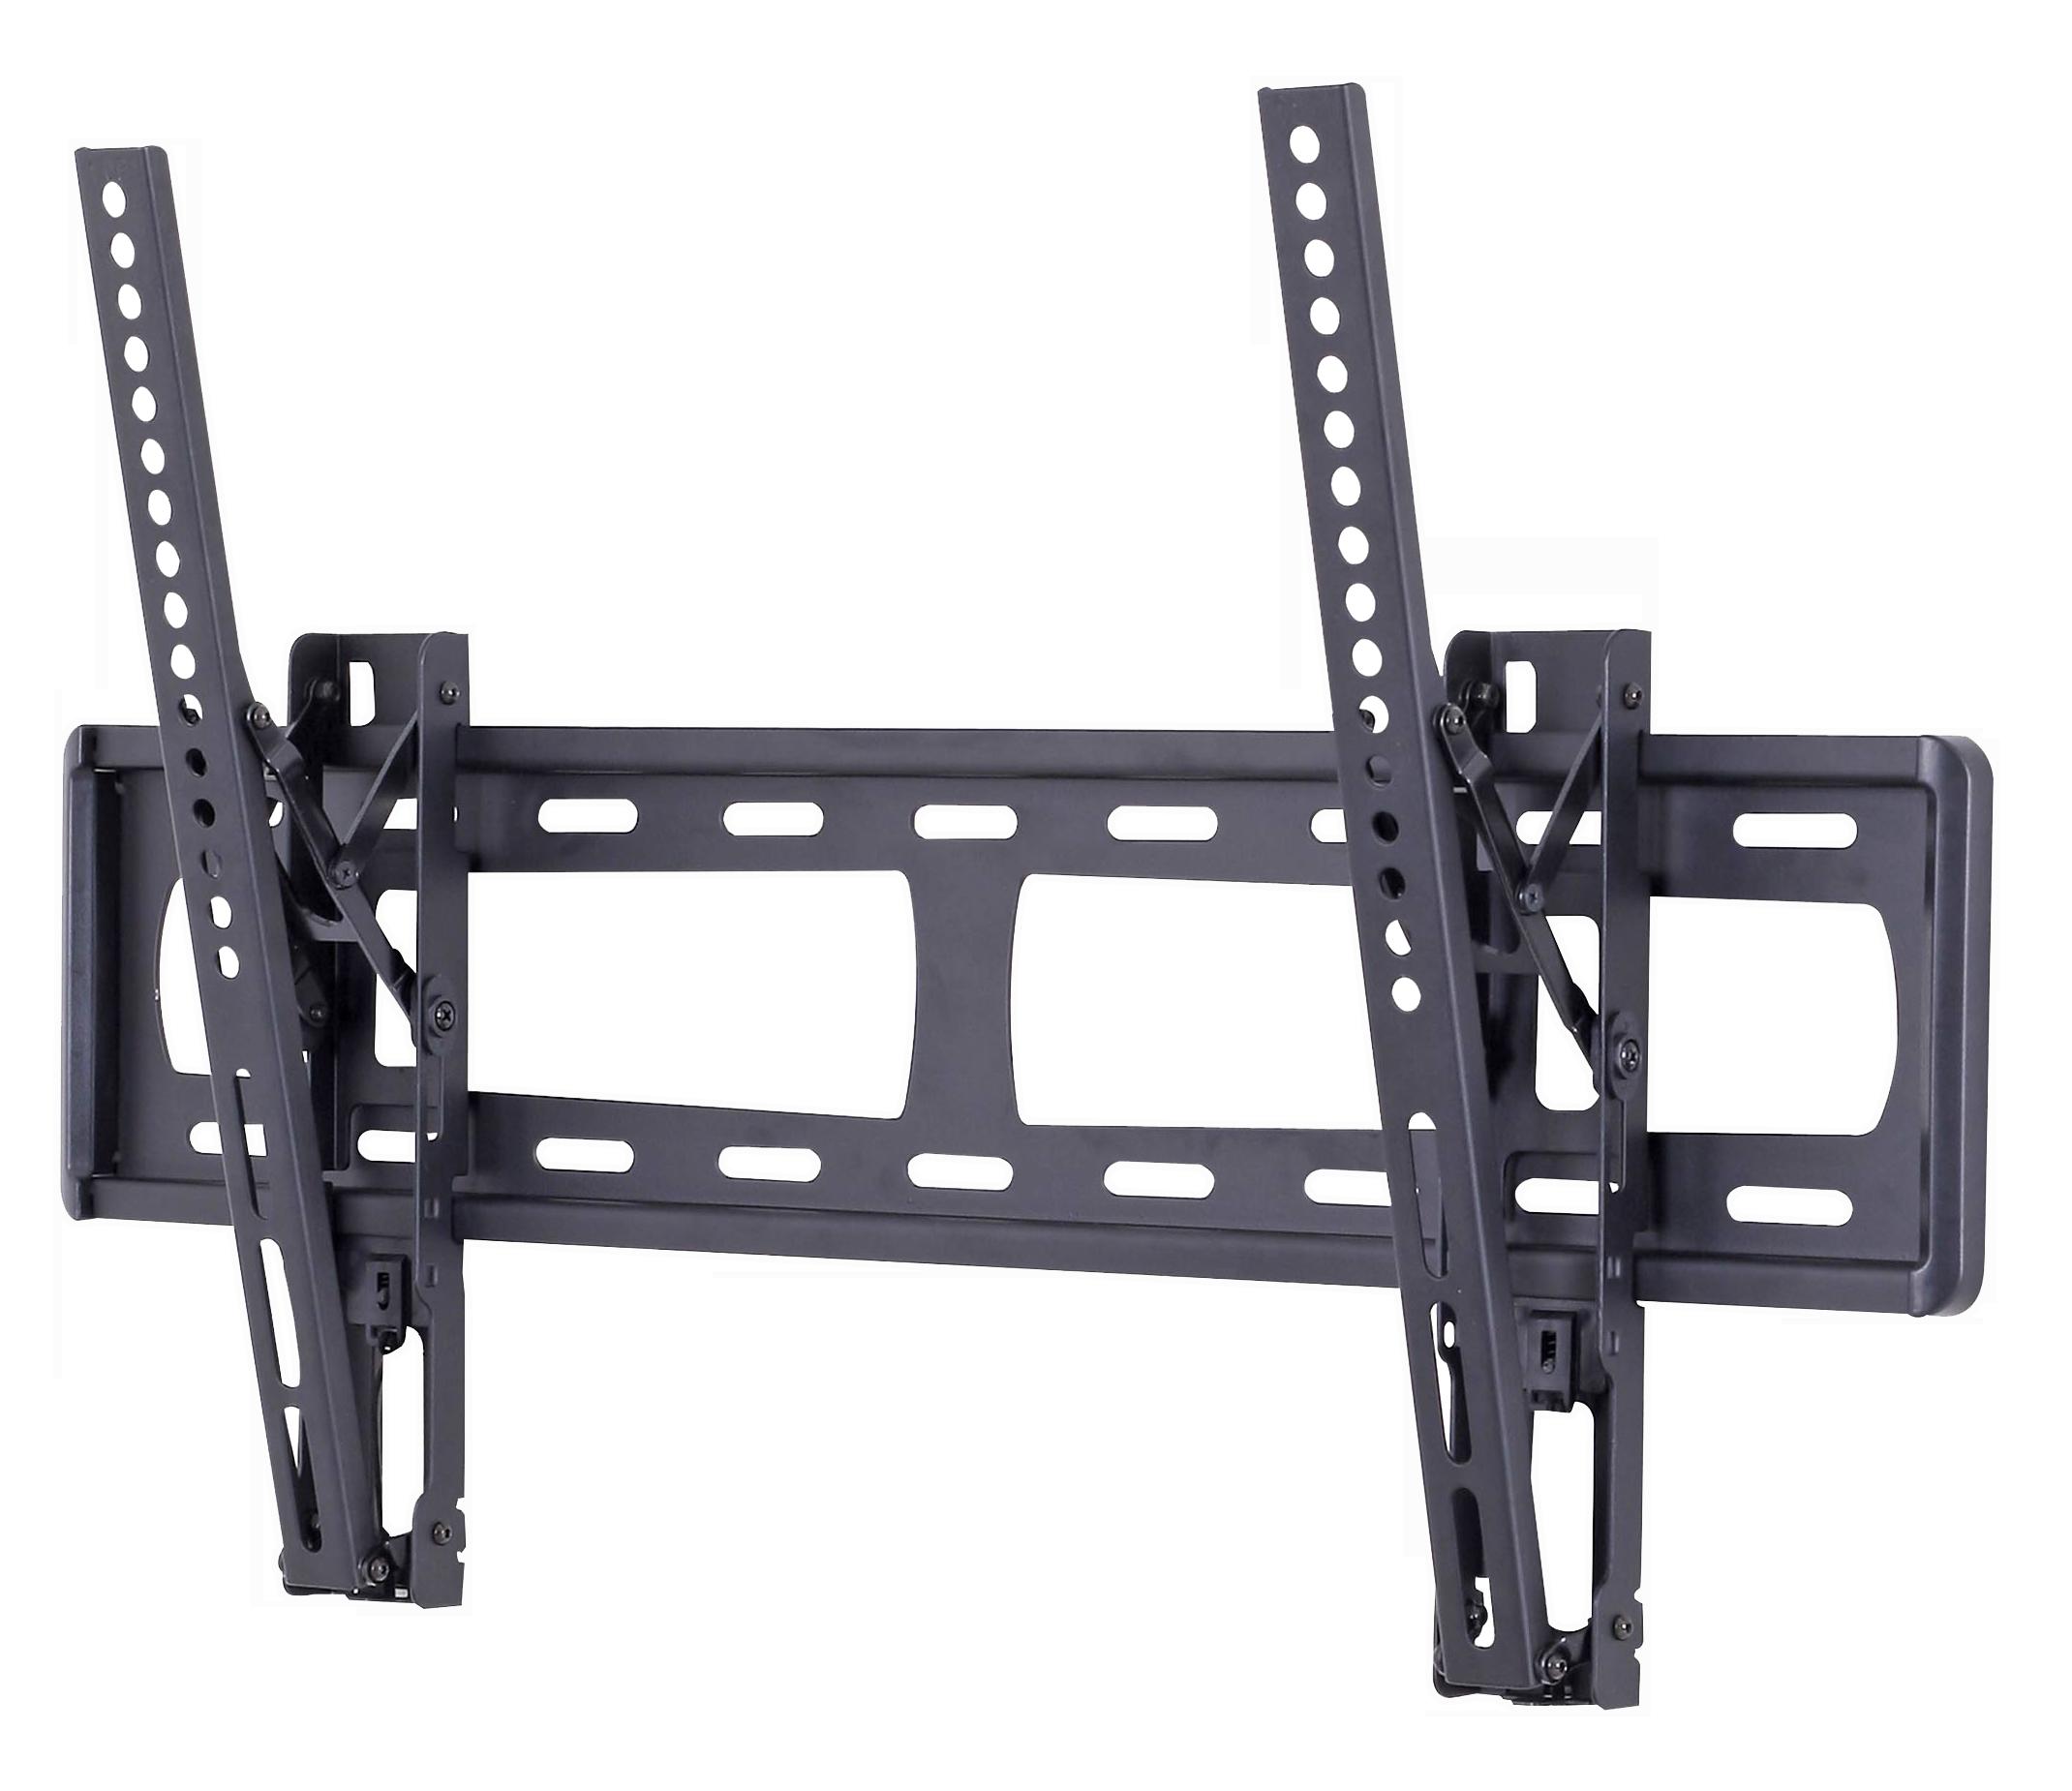 h8168-32-65inch-ultra-slim-tilting-lcd-wall-bracket.png